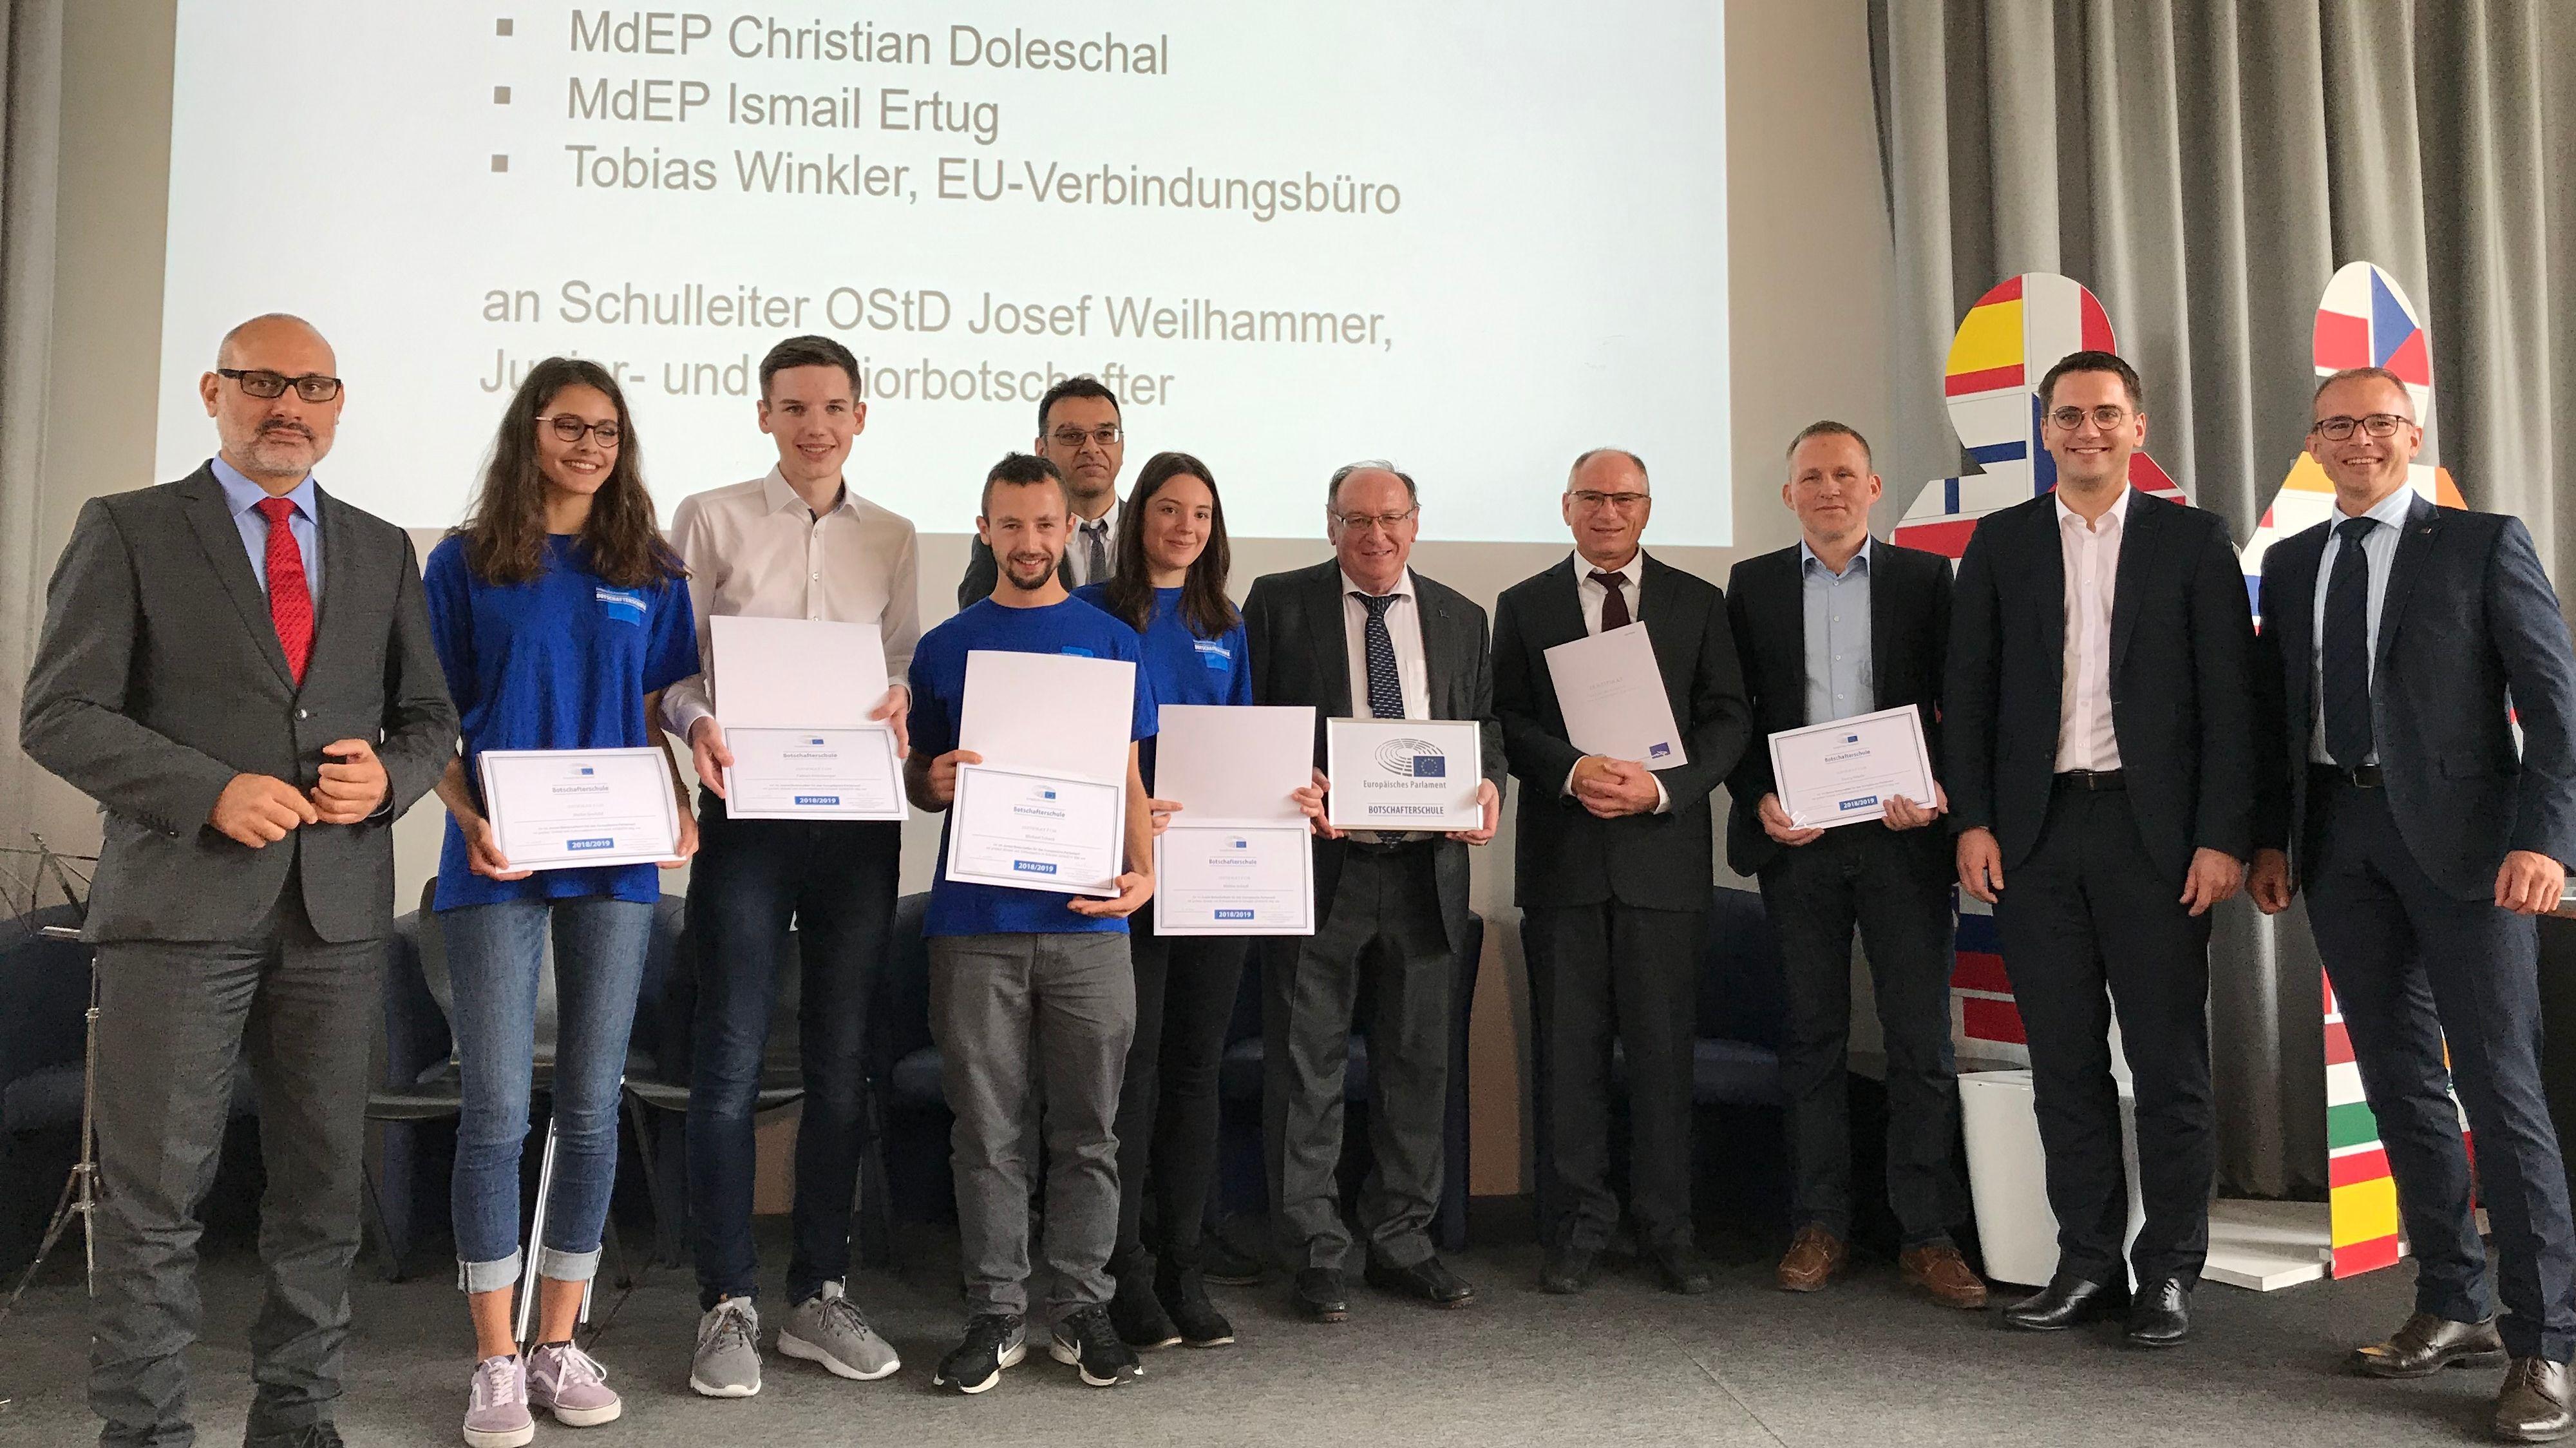 Zertifikatsverleihung an der Europa-Berufsschule in Weiden mit Ismail Ertug (links) und Christian Doleschal (2.v.r.)